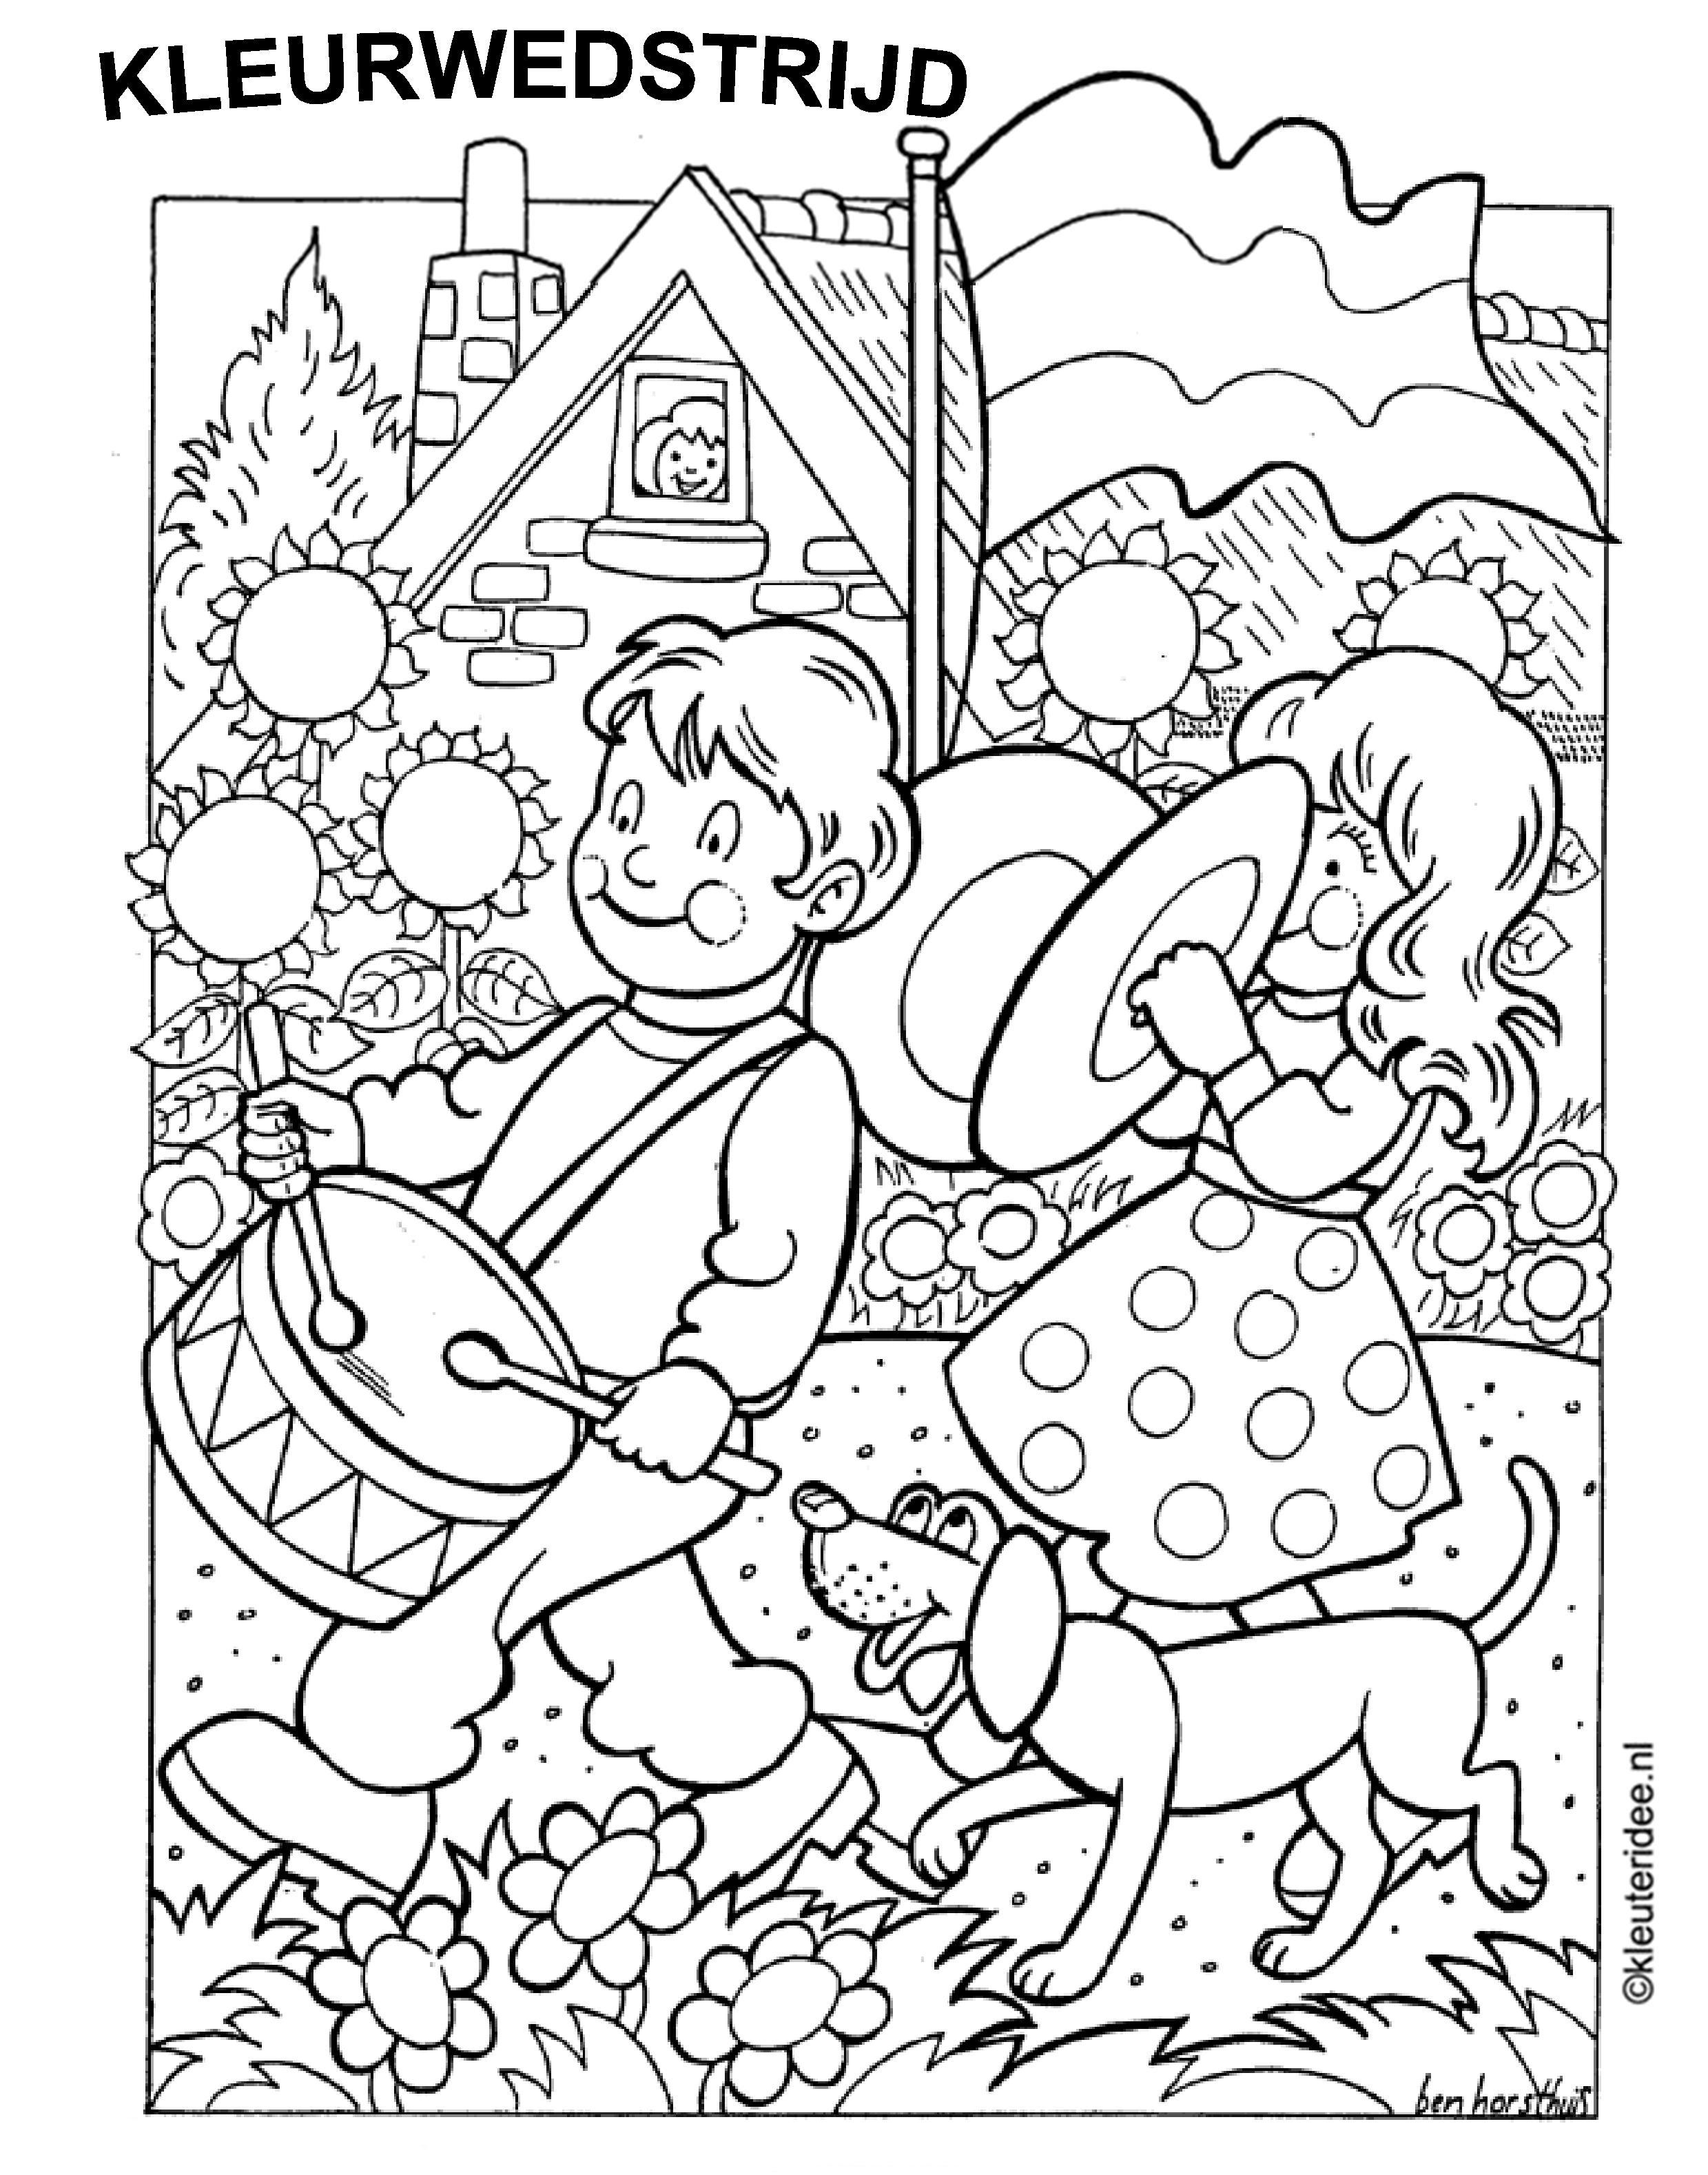 kleurplaat prinsjesdag 2015 kidkleurplaat nl